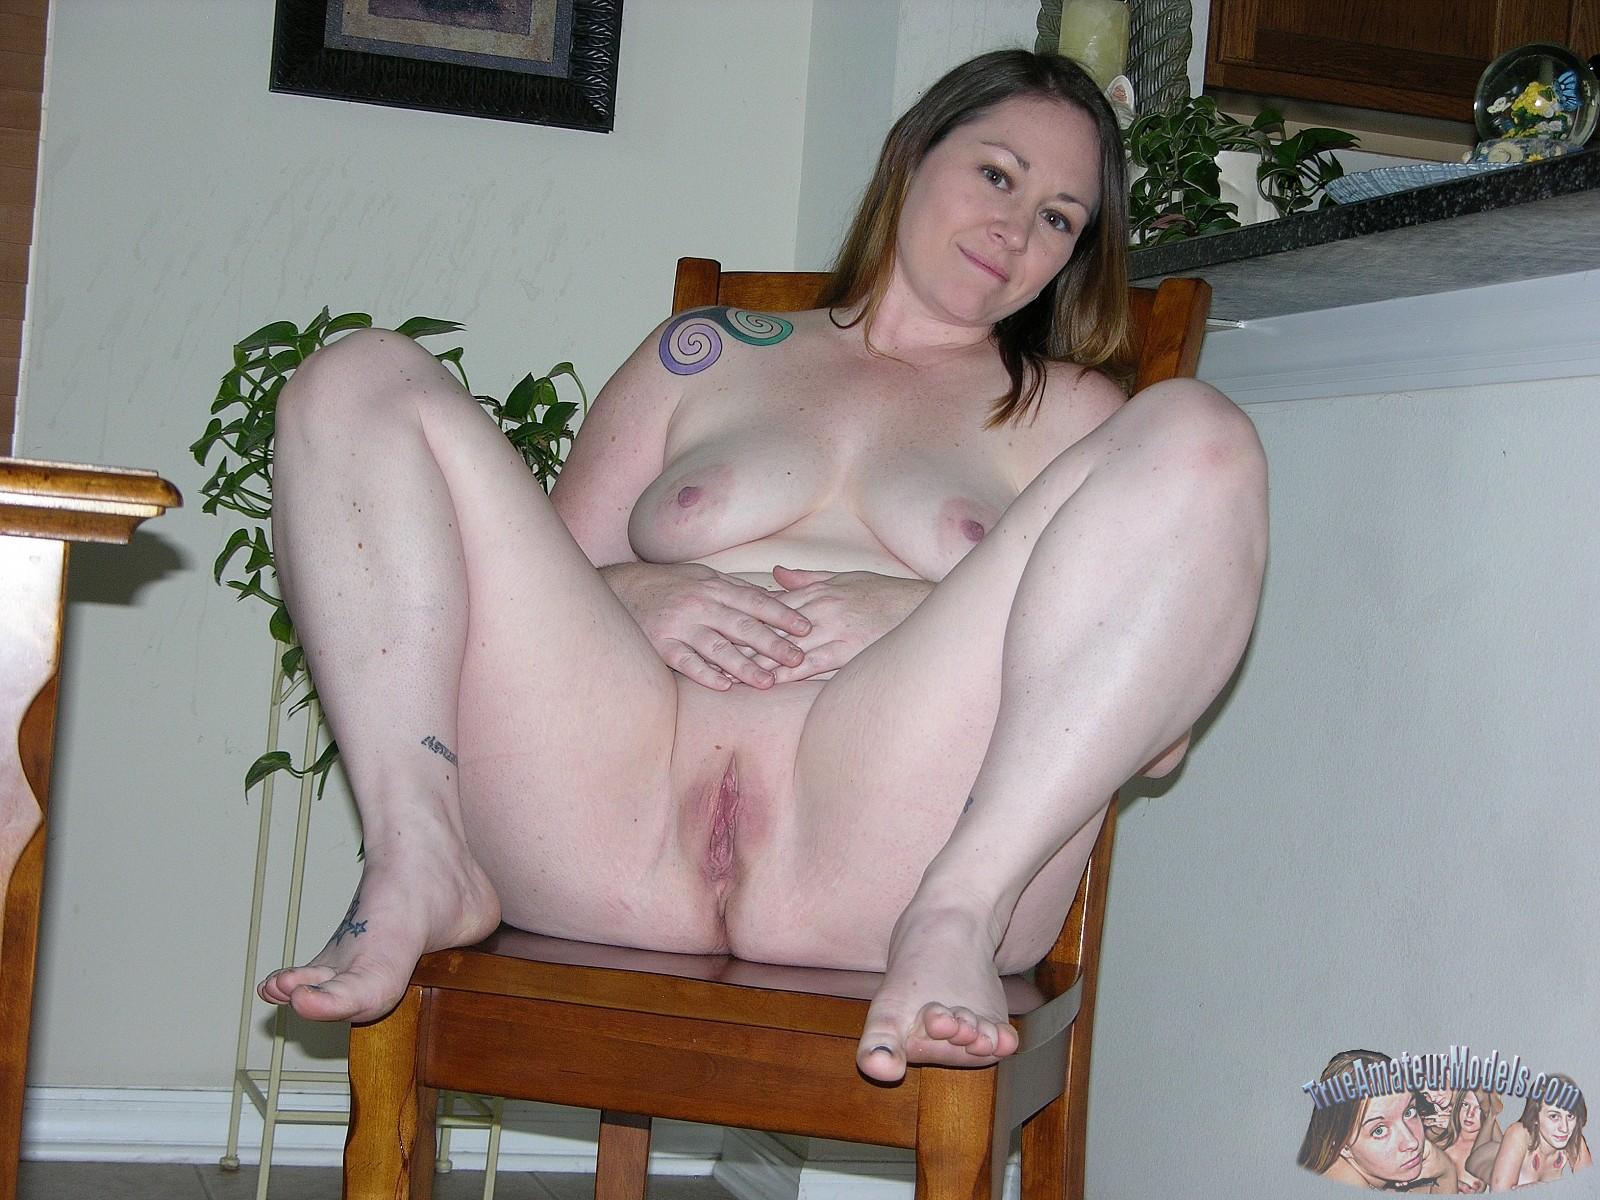 Amateur Bbw Nude Model Meredith - Trueamateurmodelscom-8300